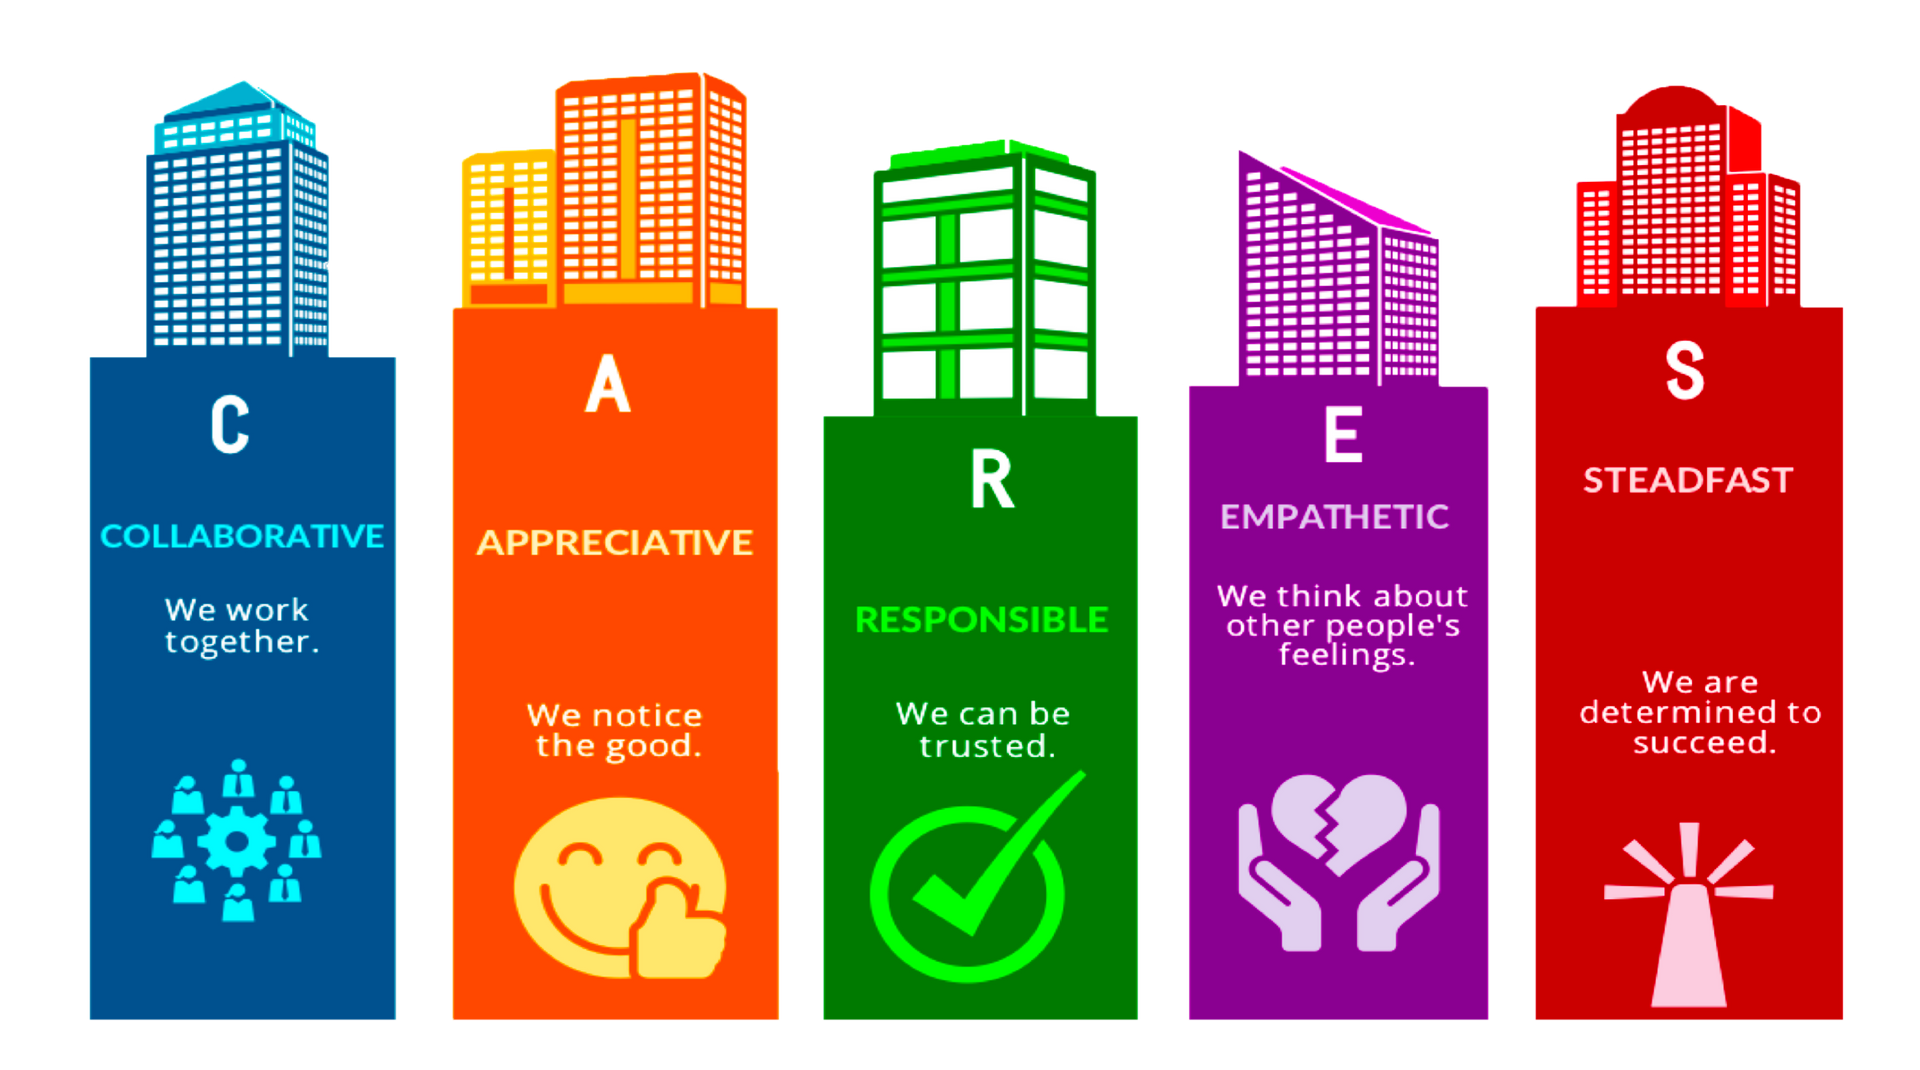 CARES Values